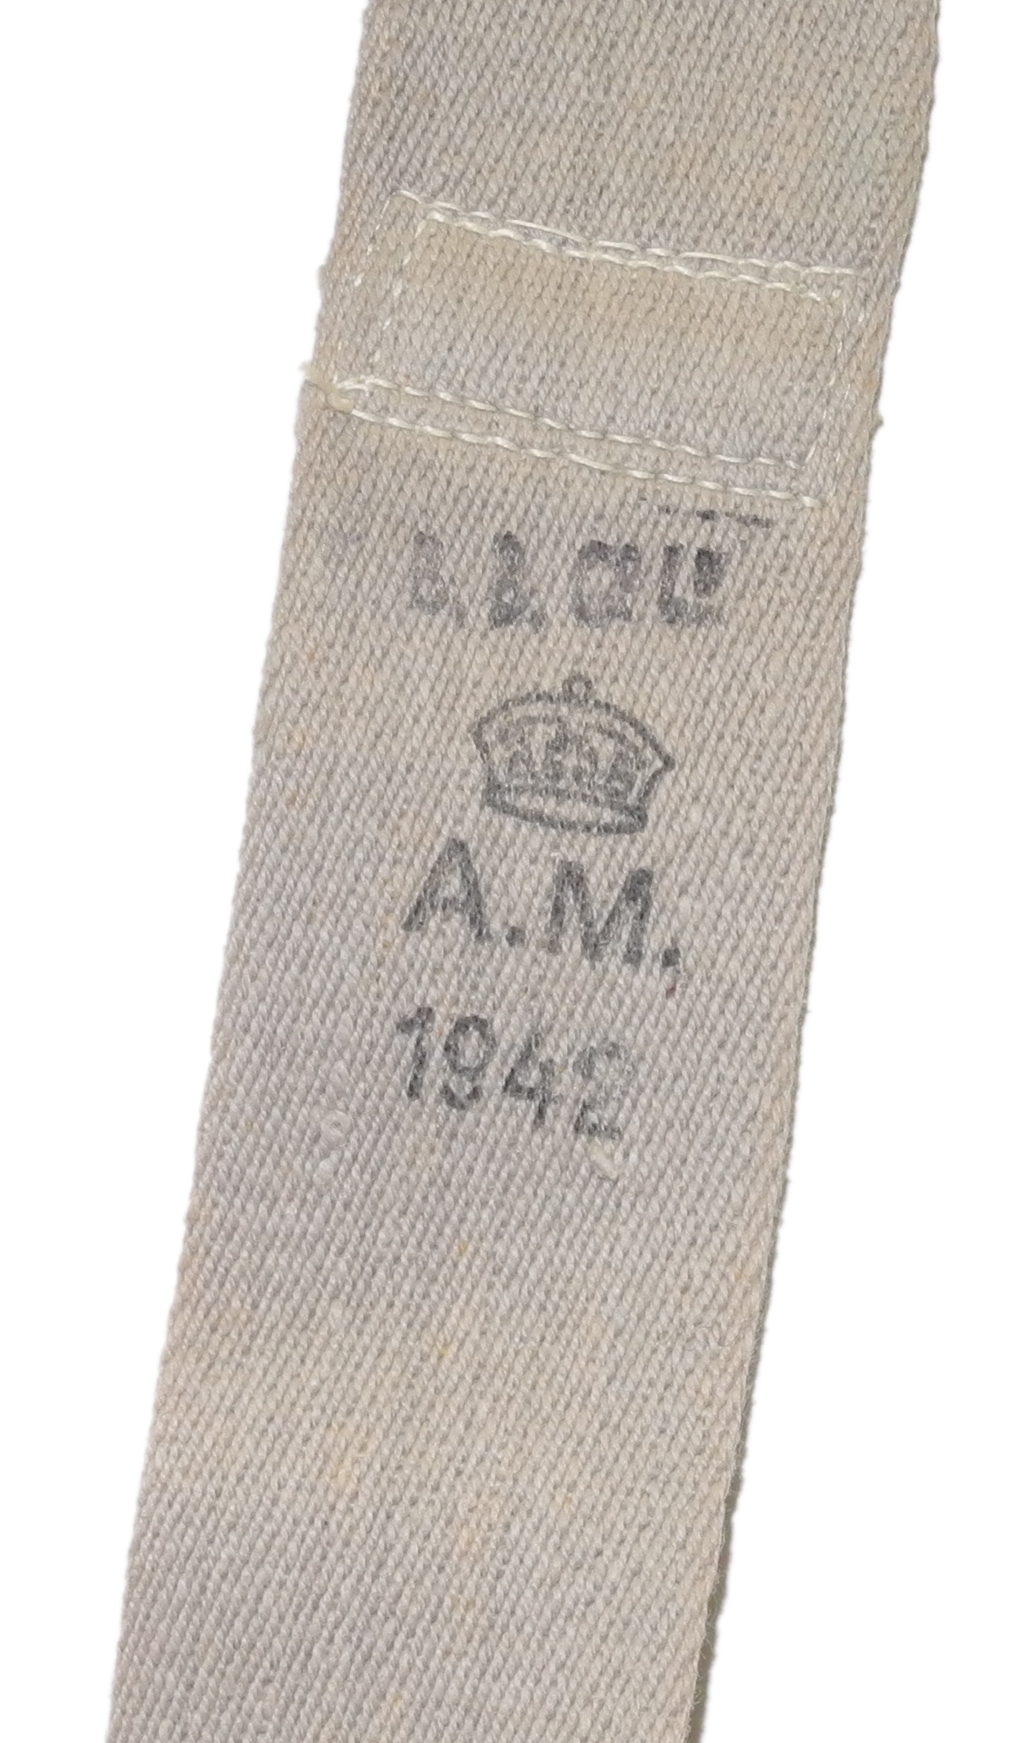 RAF  trouser braces / suspenders